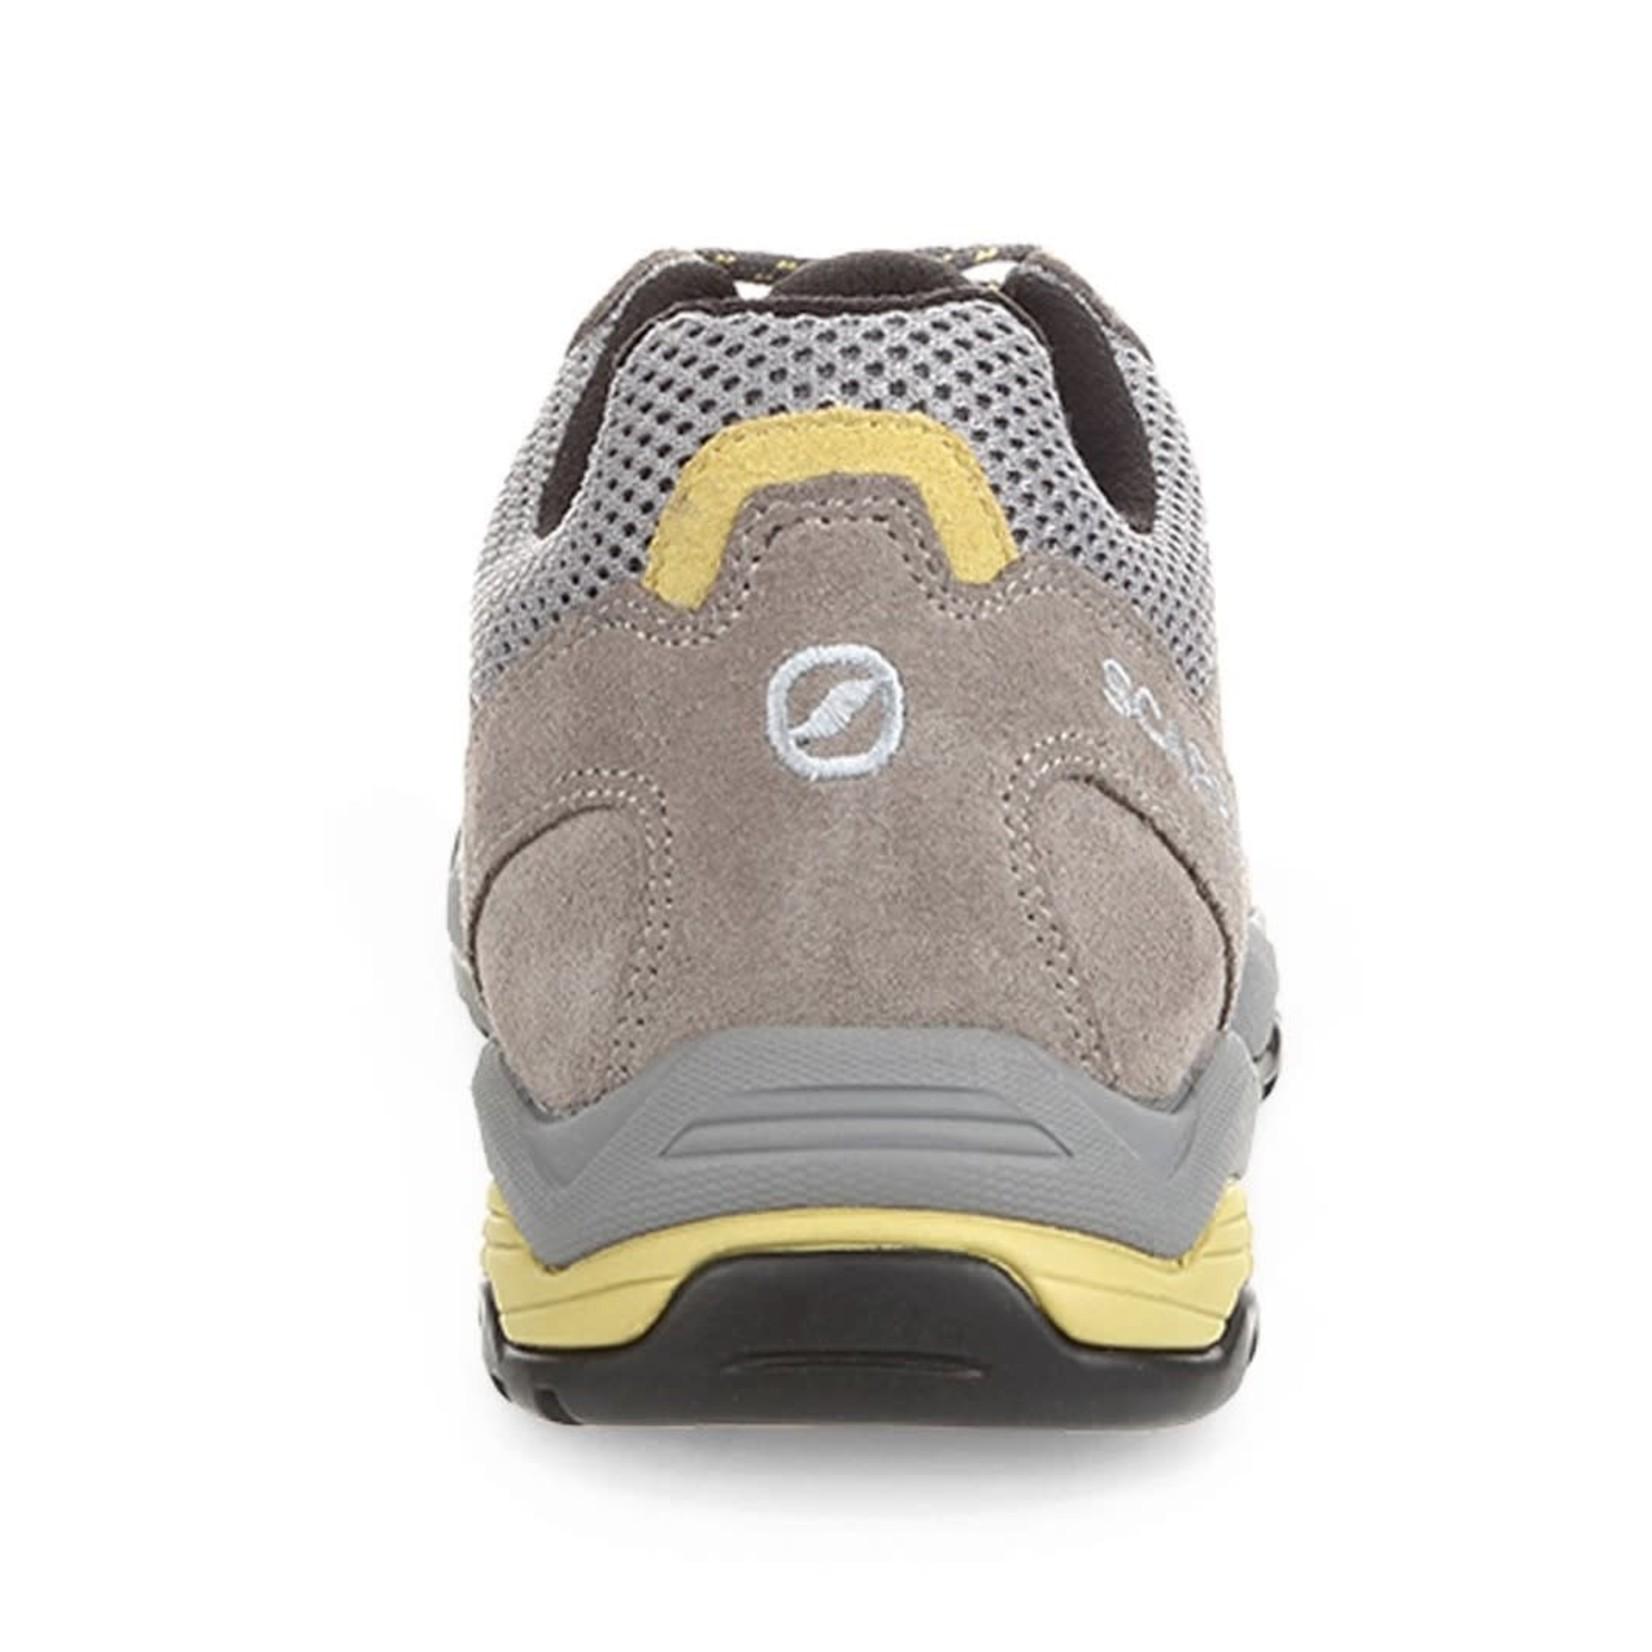 Scarpa Scarpa Moraine Air Shoes - Men